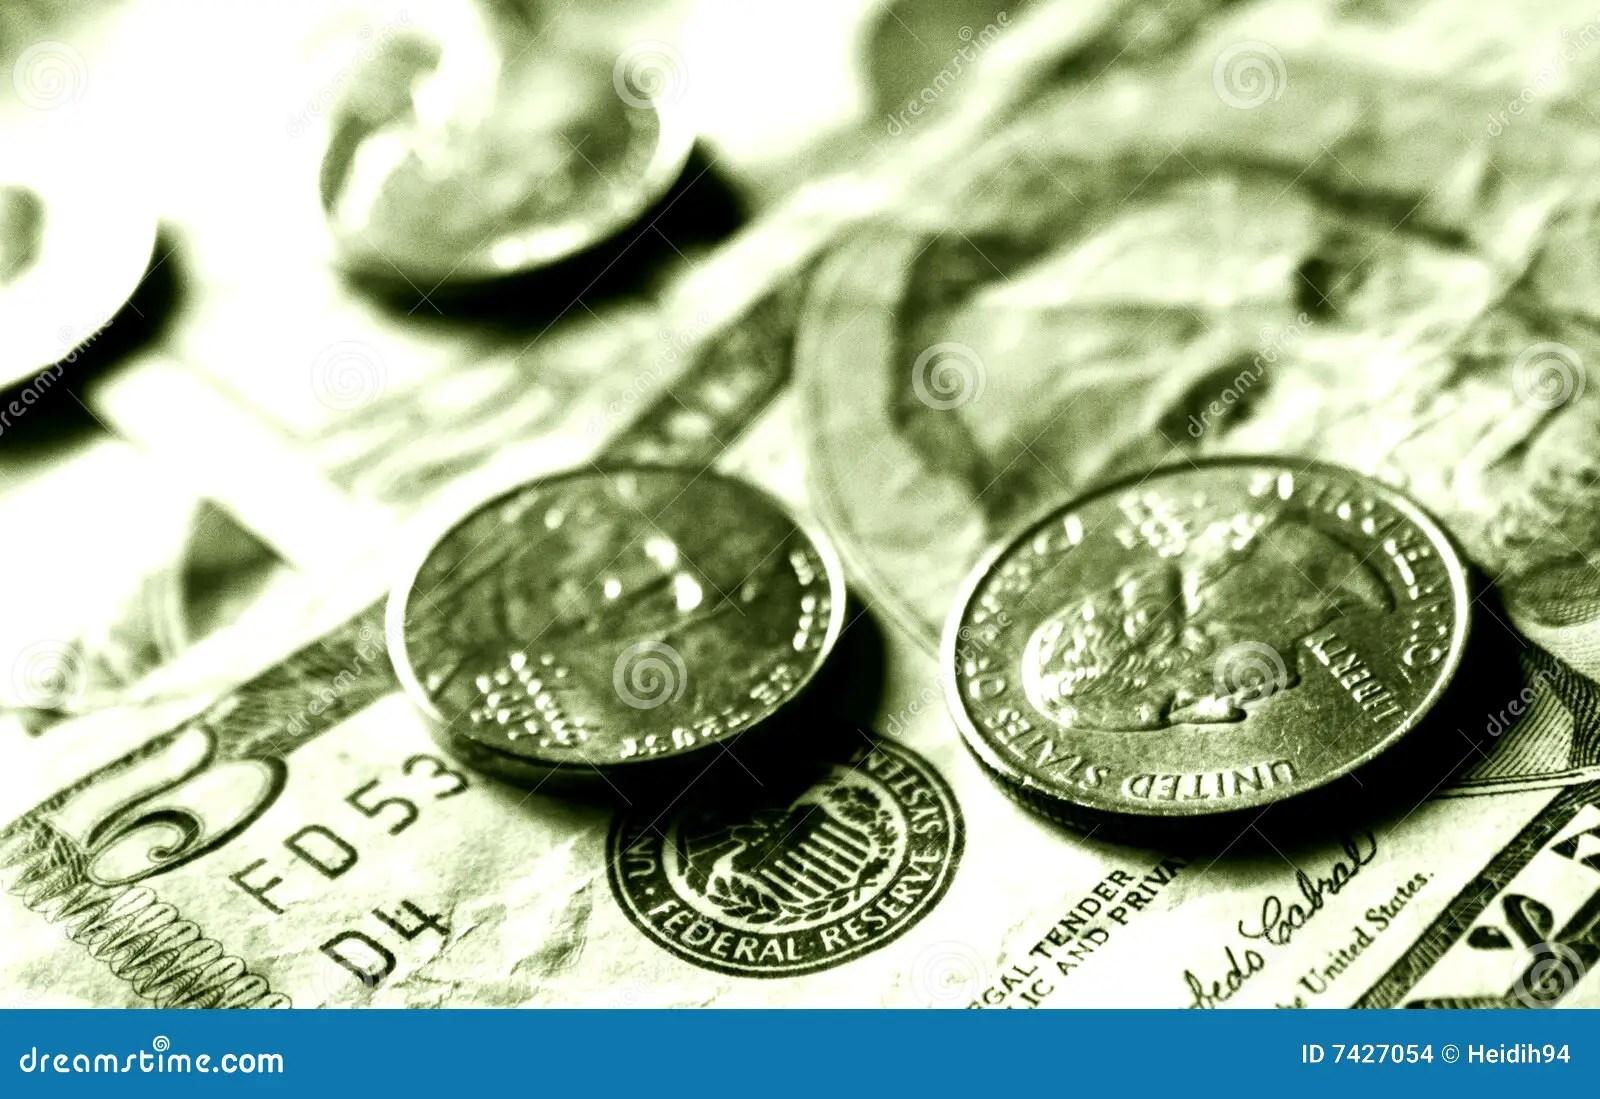 Dollars And Cents Stock Photo Image Of Washington Five